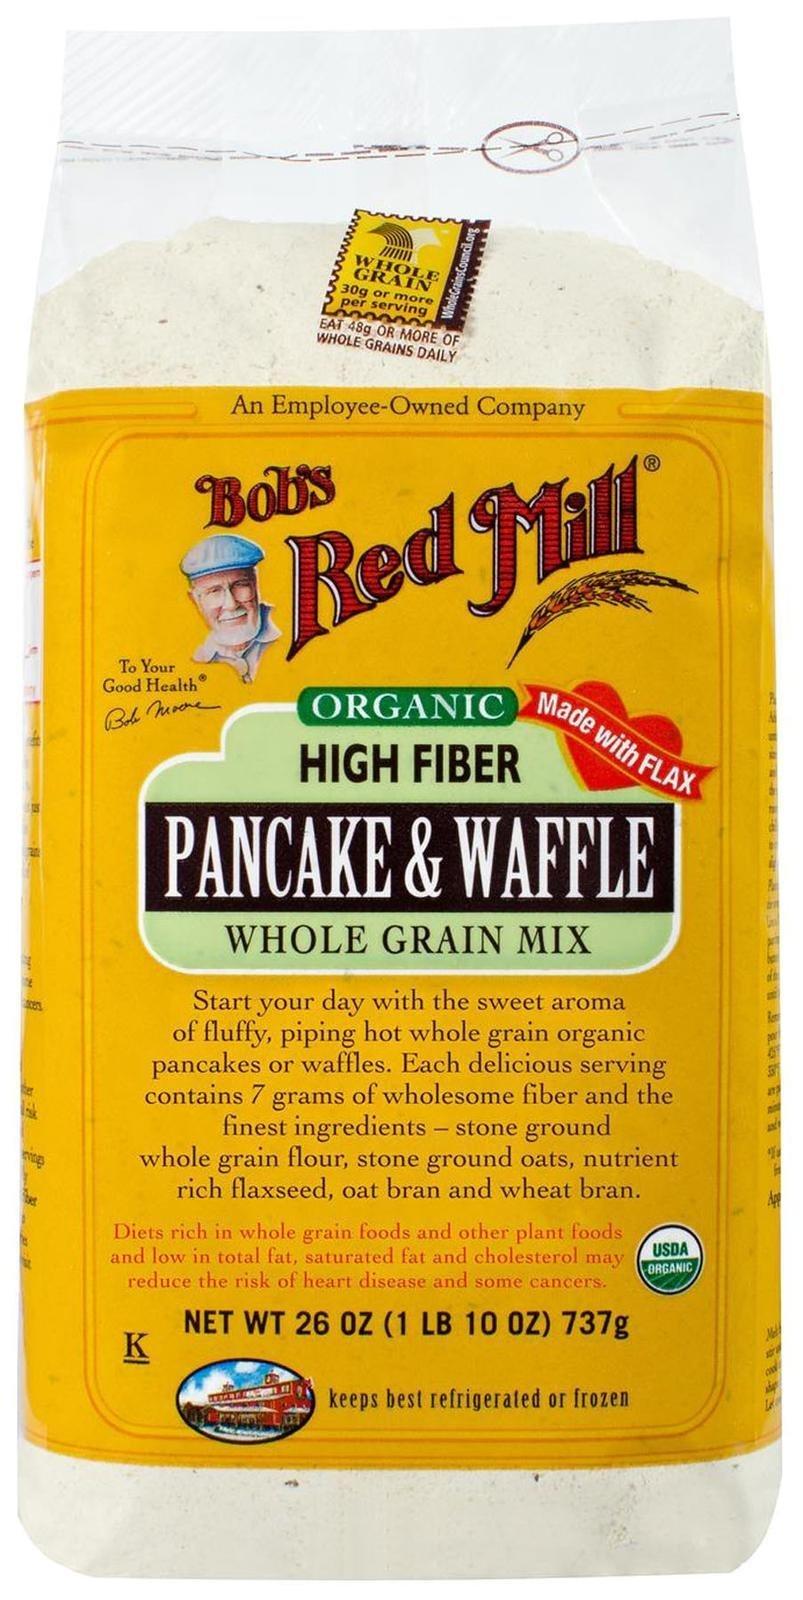 Bob's Red Mill Organic High Fiber Pancake & Waffle Mix - 26 oz